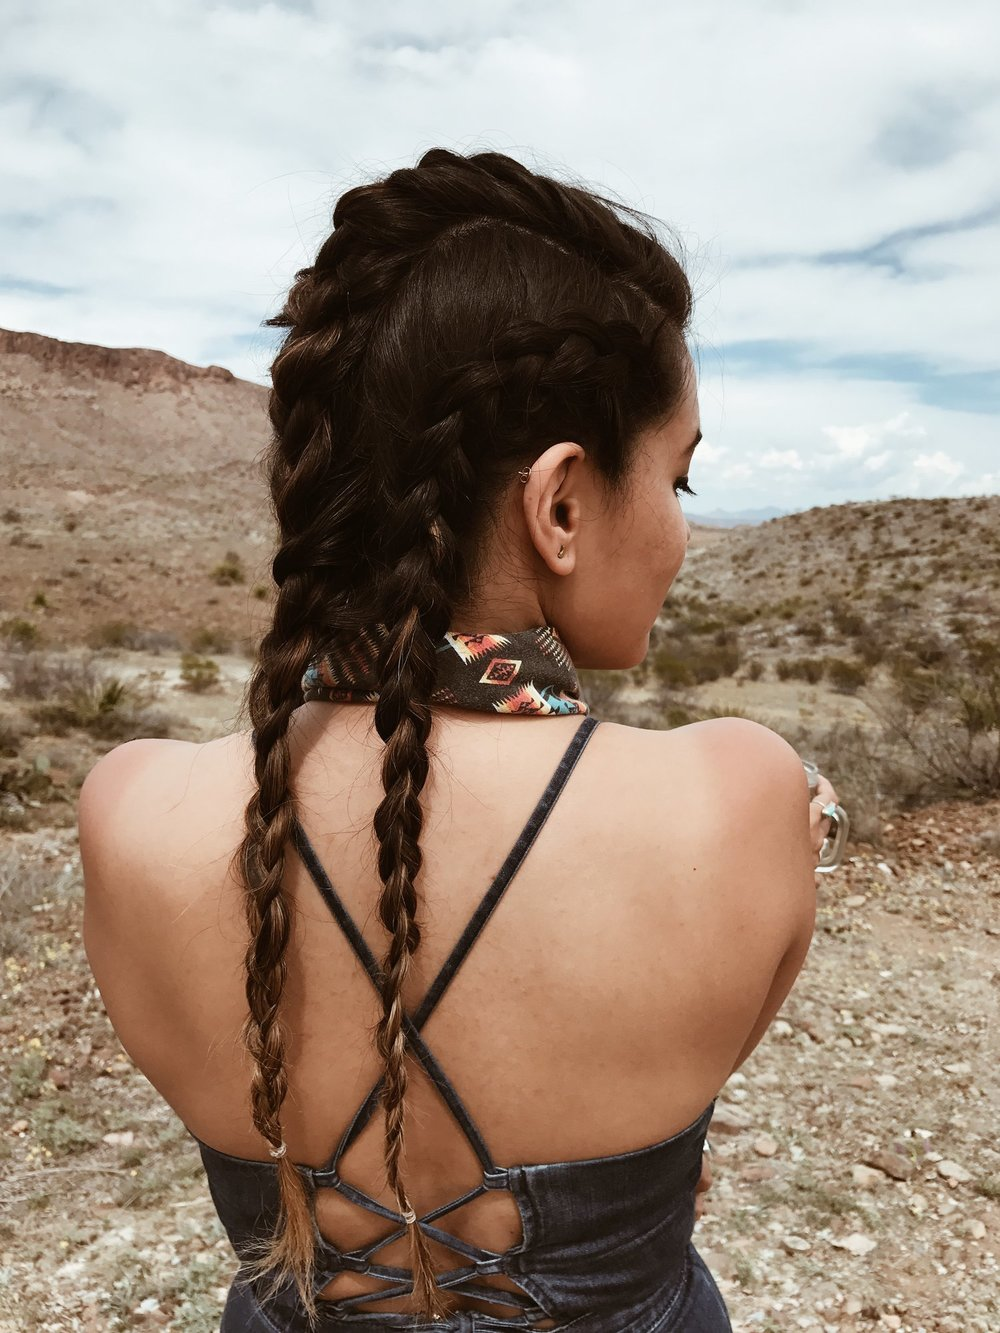 Iheartbueno_Buenosjourneywest-hair